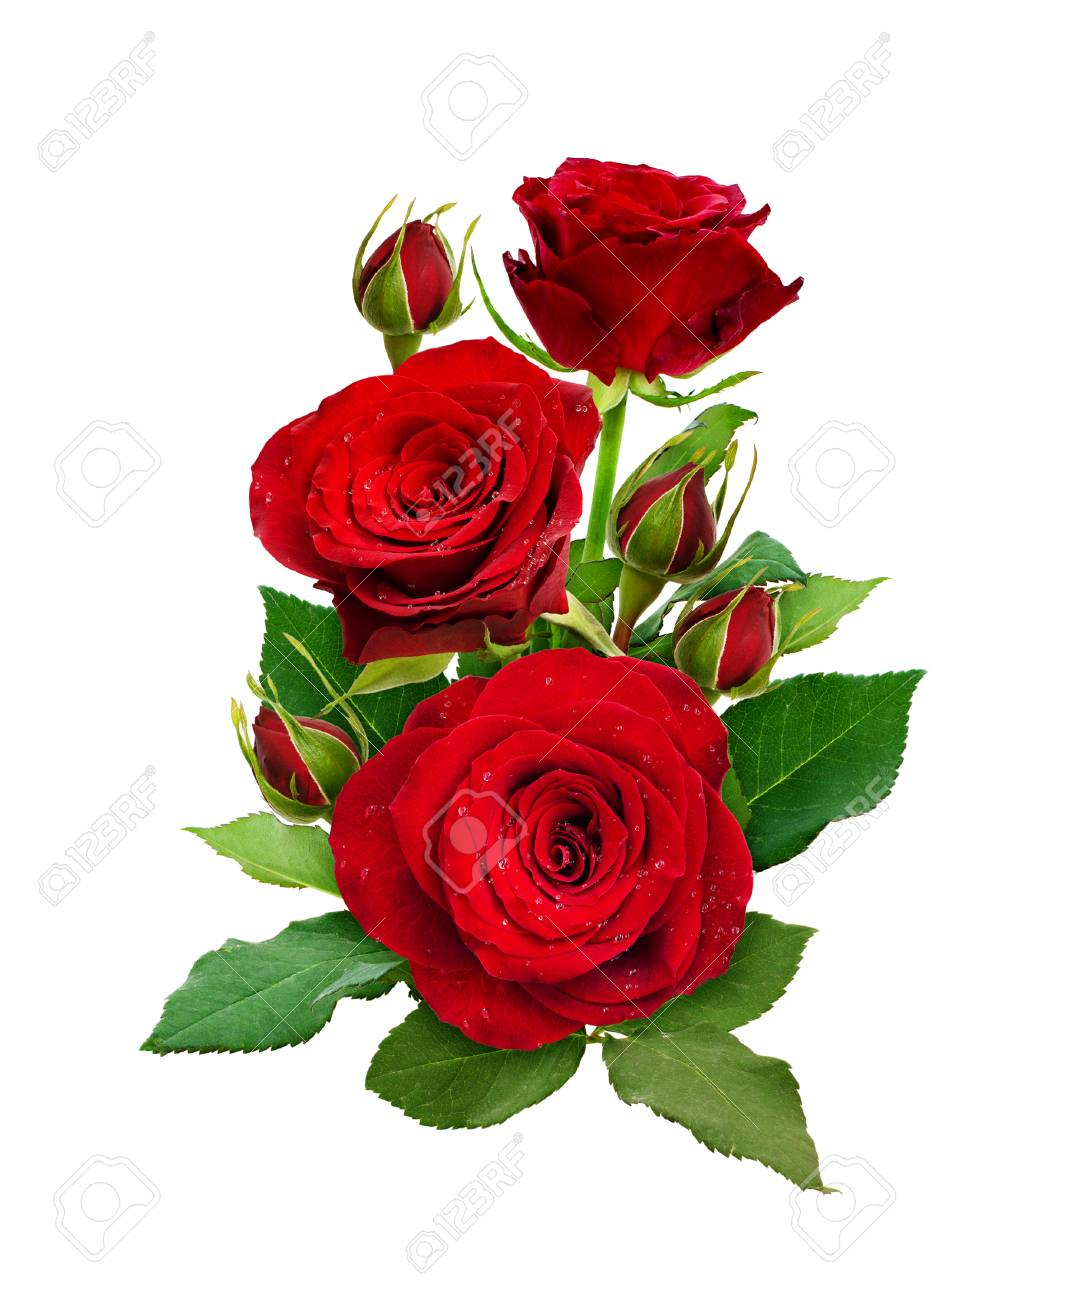 romantic arrangement with red